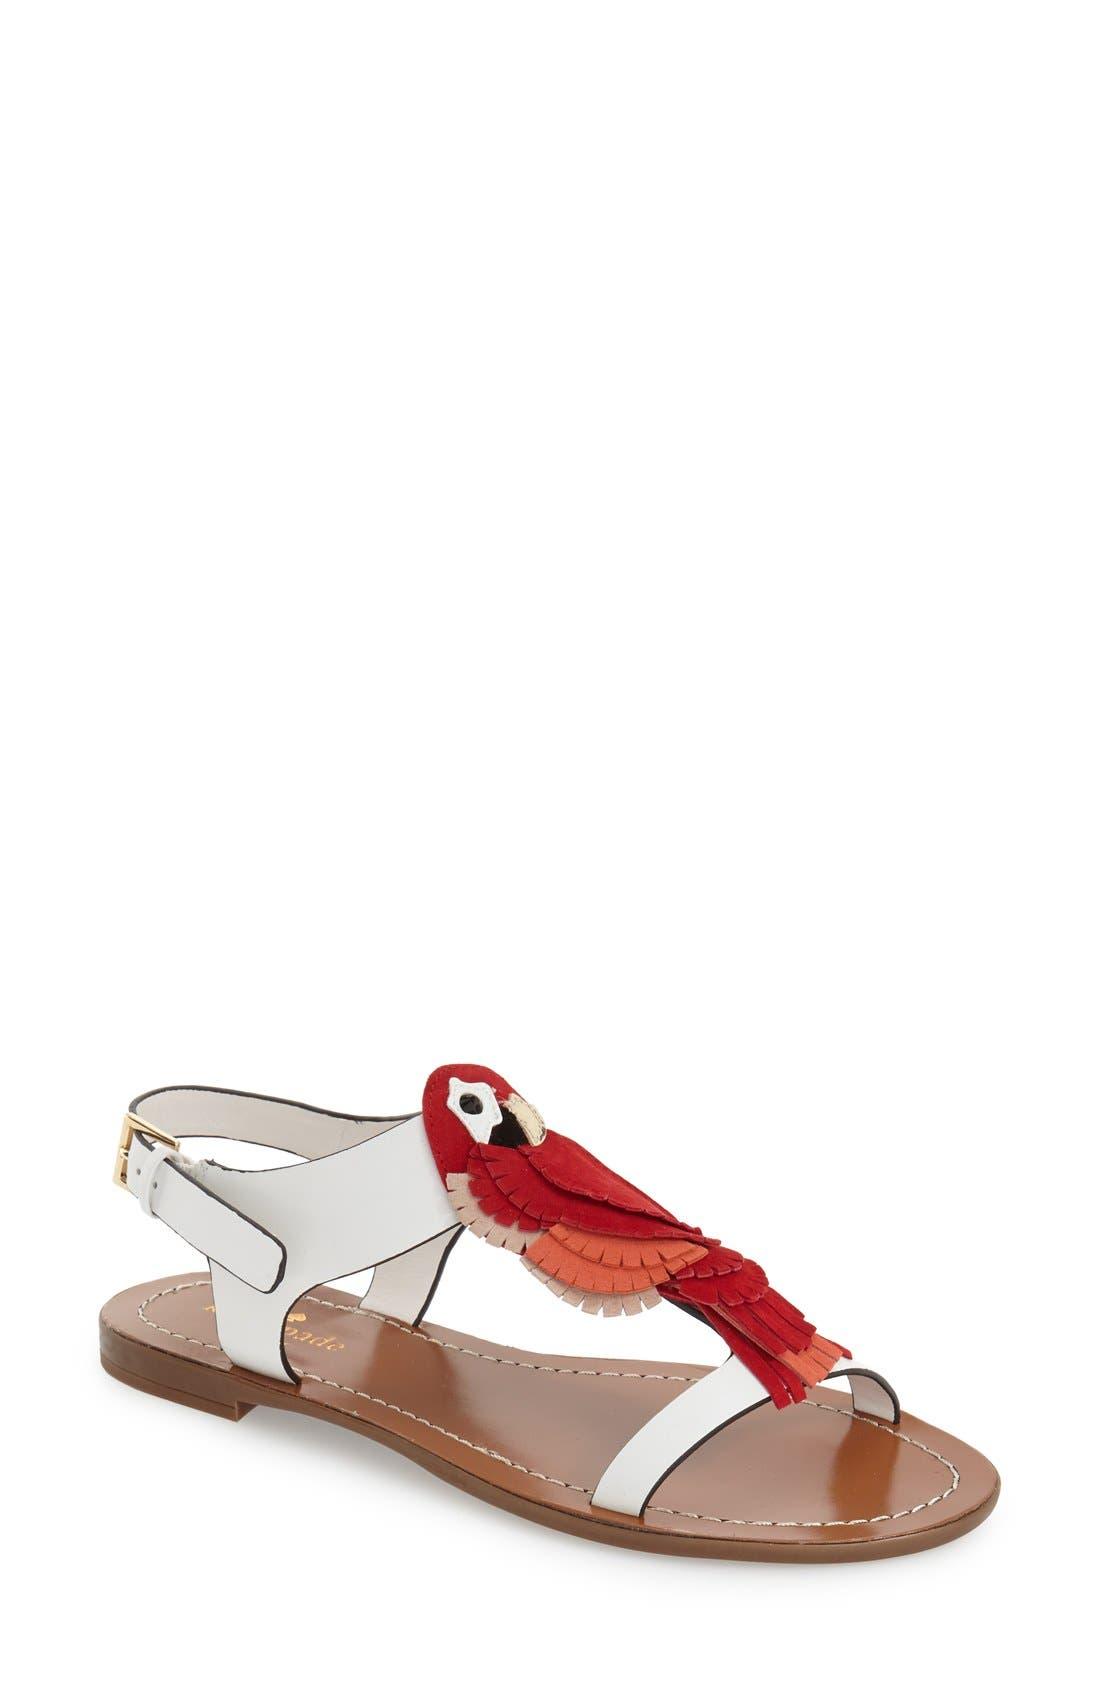 Main Image - kate spade new york 'charlie' sandal (Women)